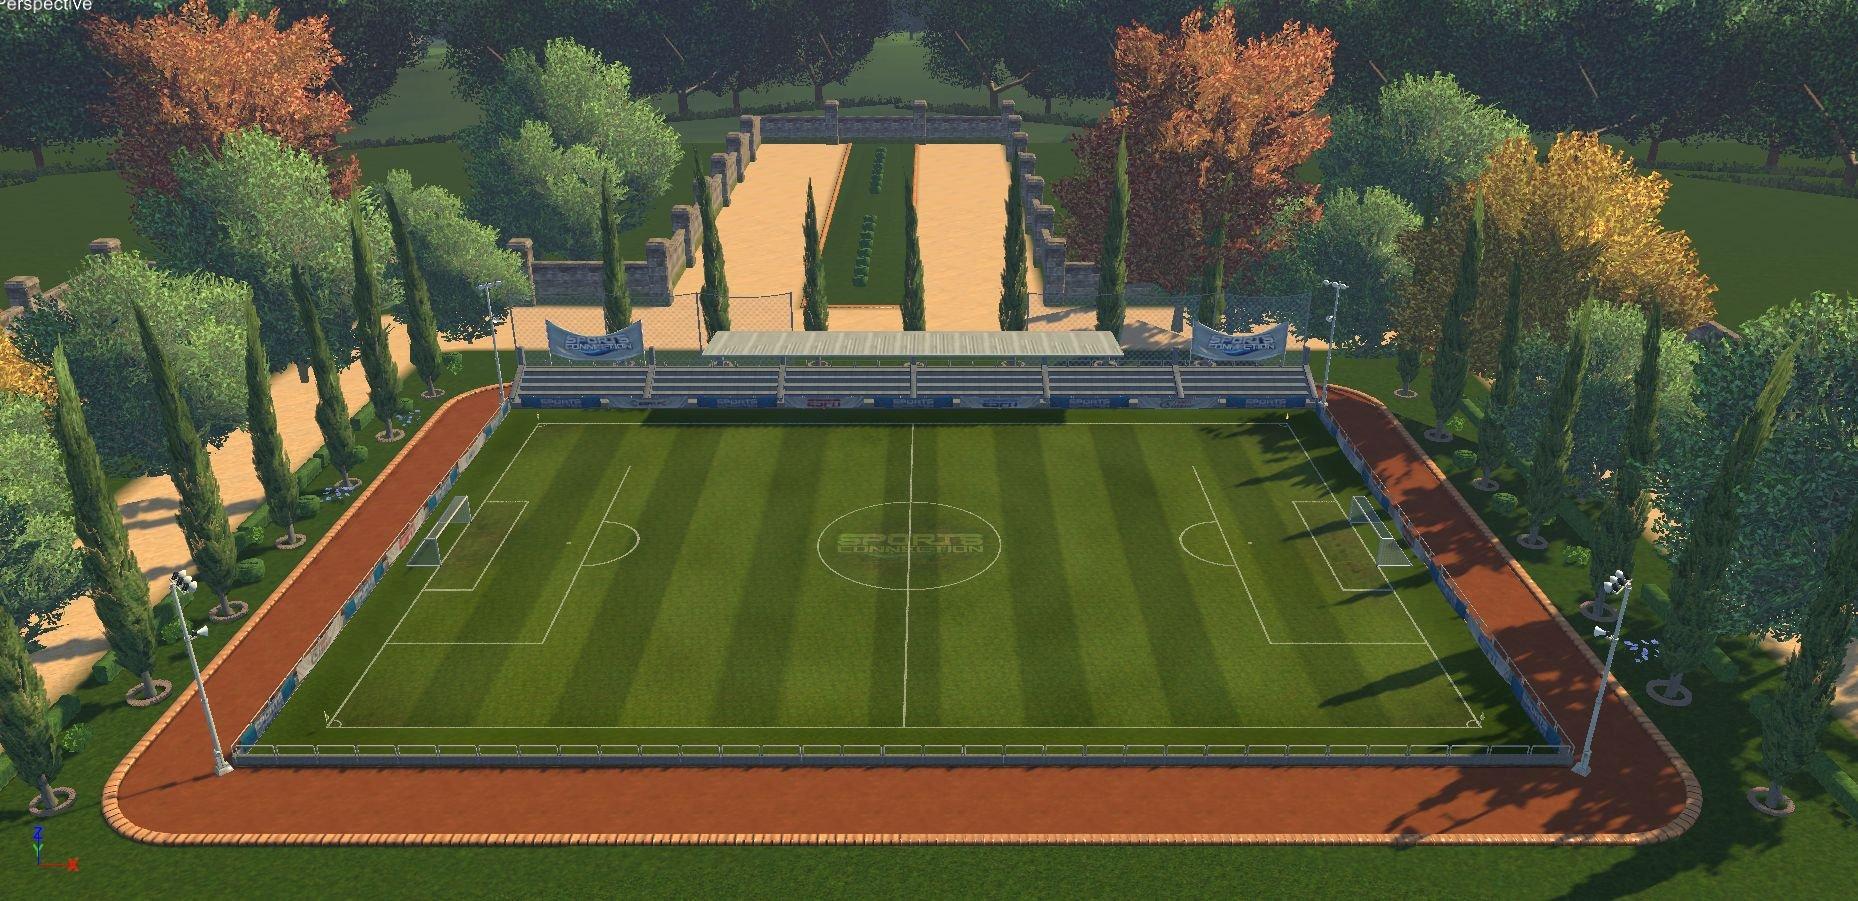 Pere balsach sc soccer 01 02